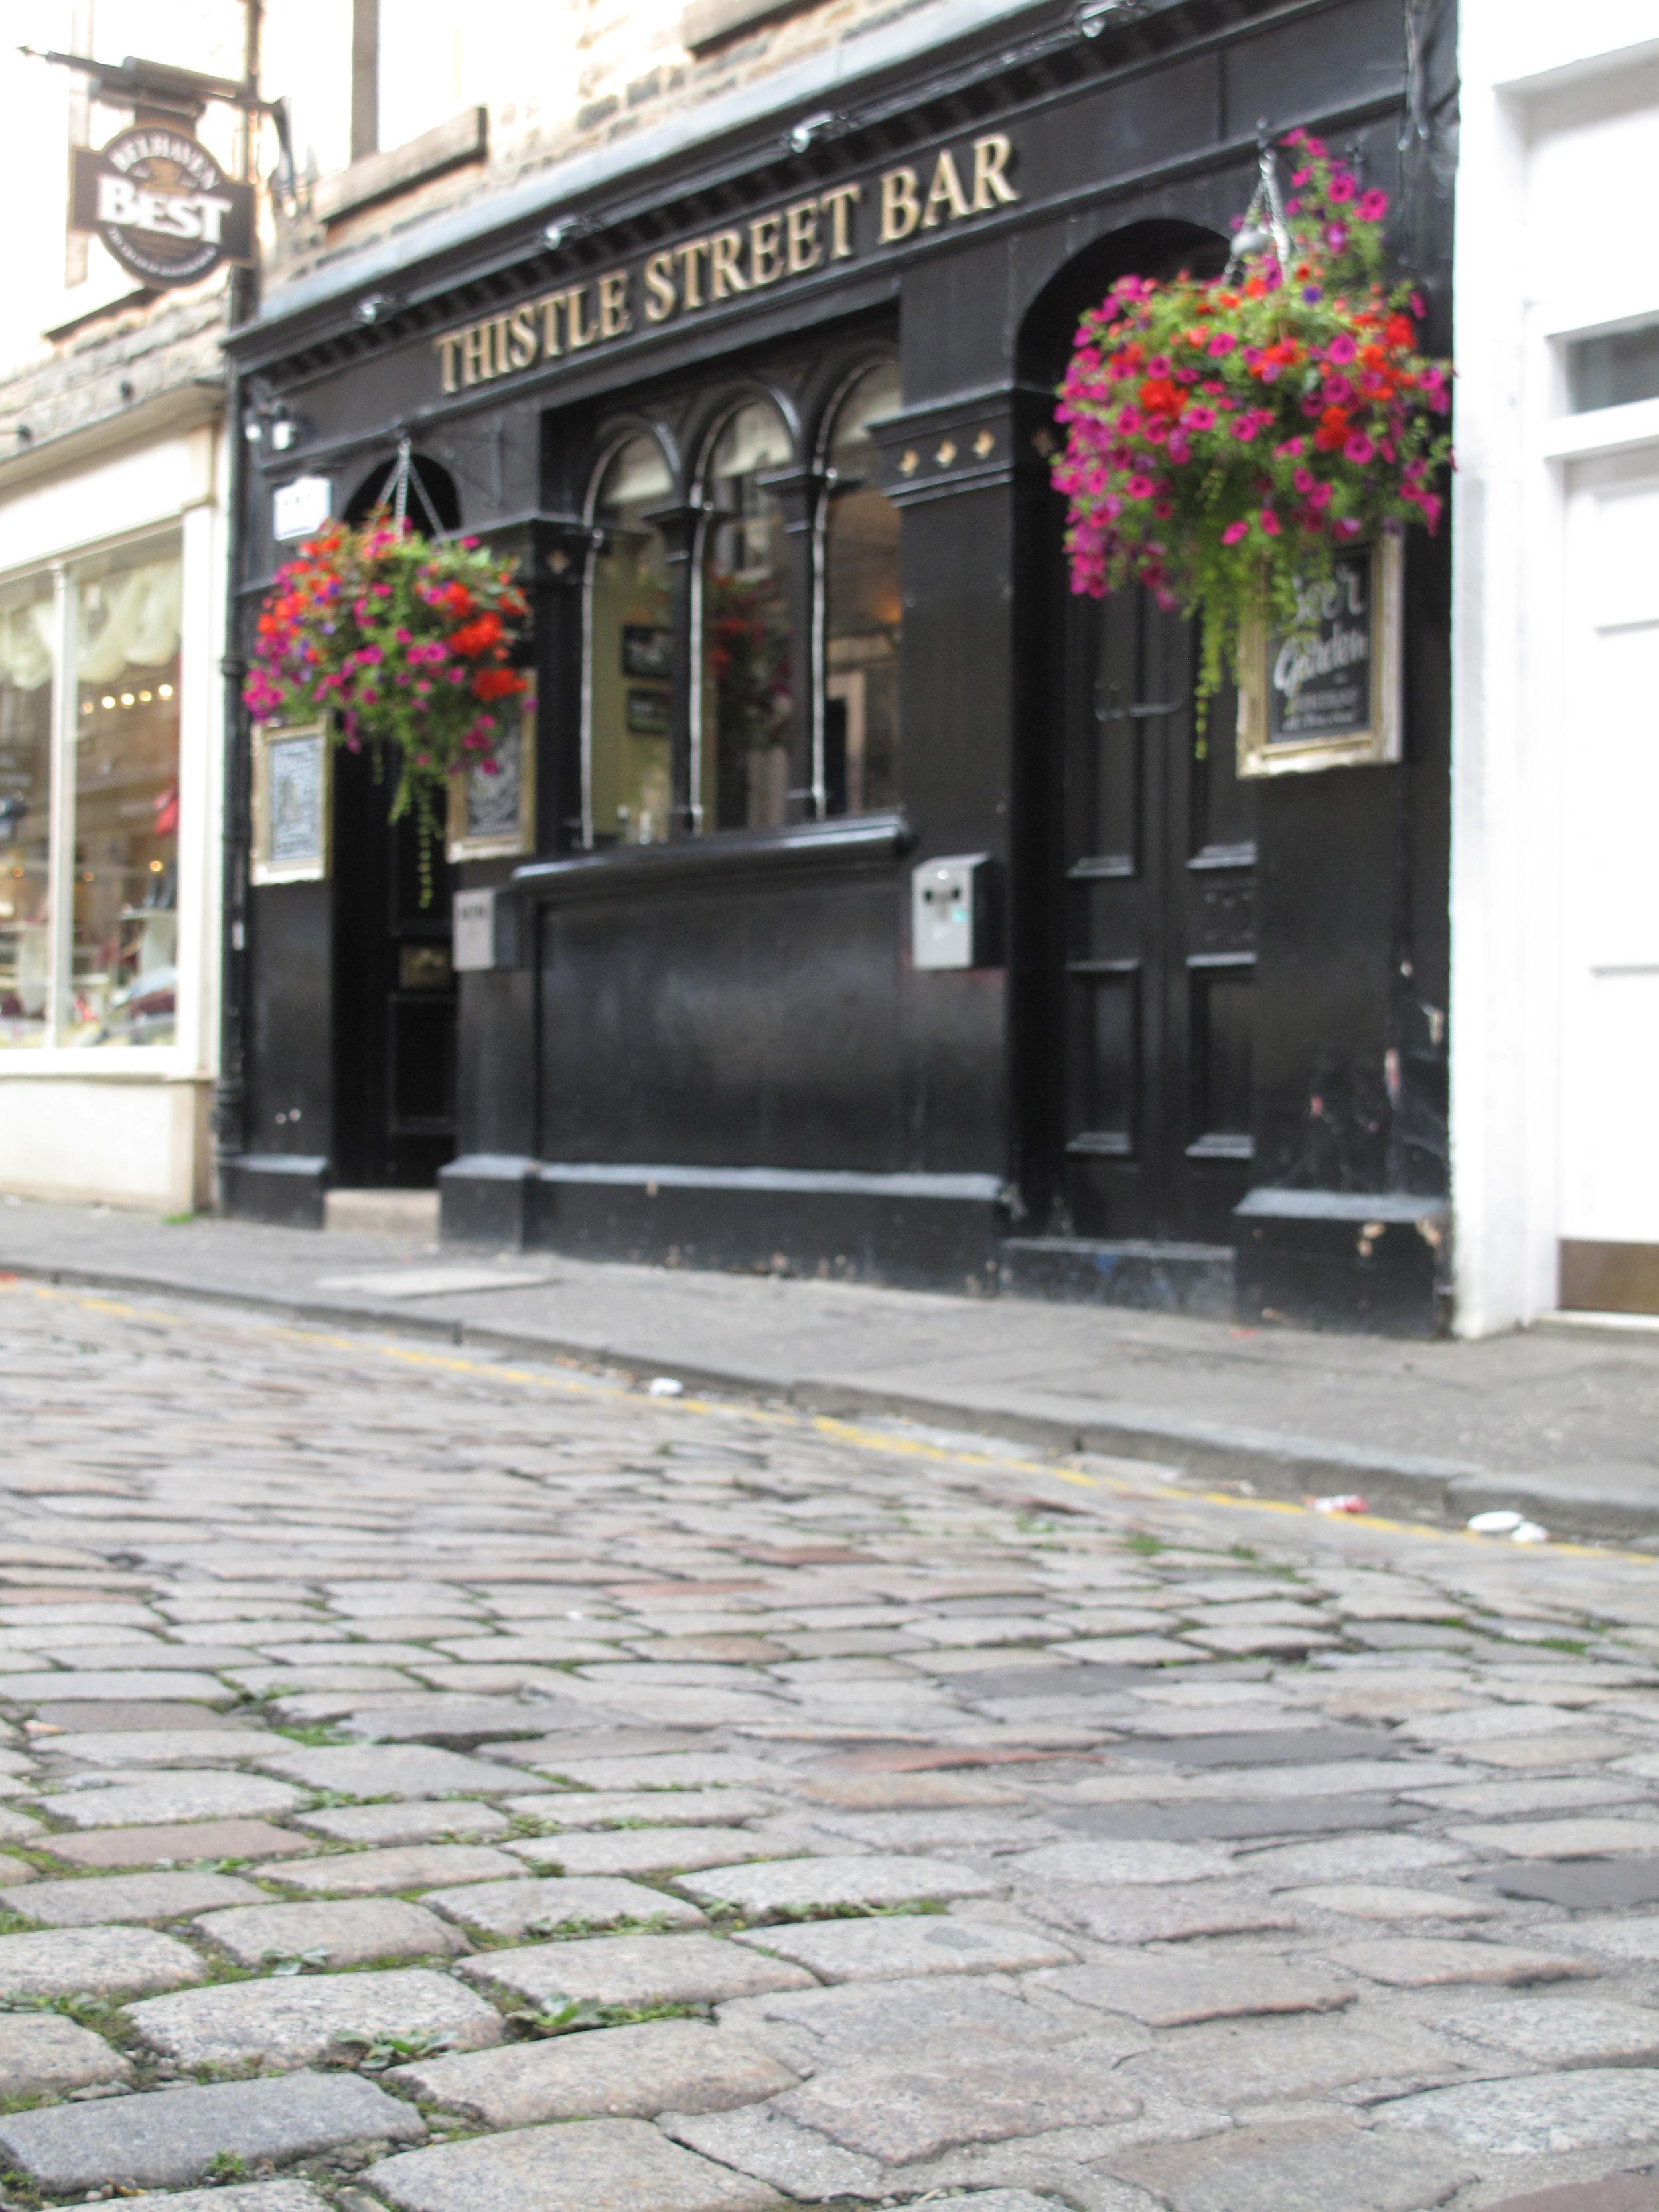 Thistle Street Bar, Edinburgh.